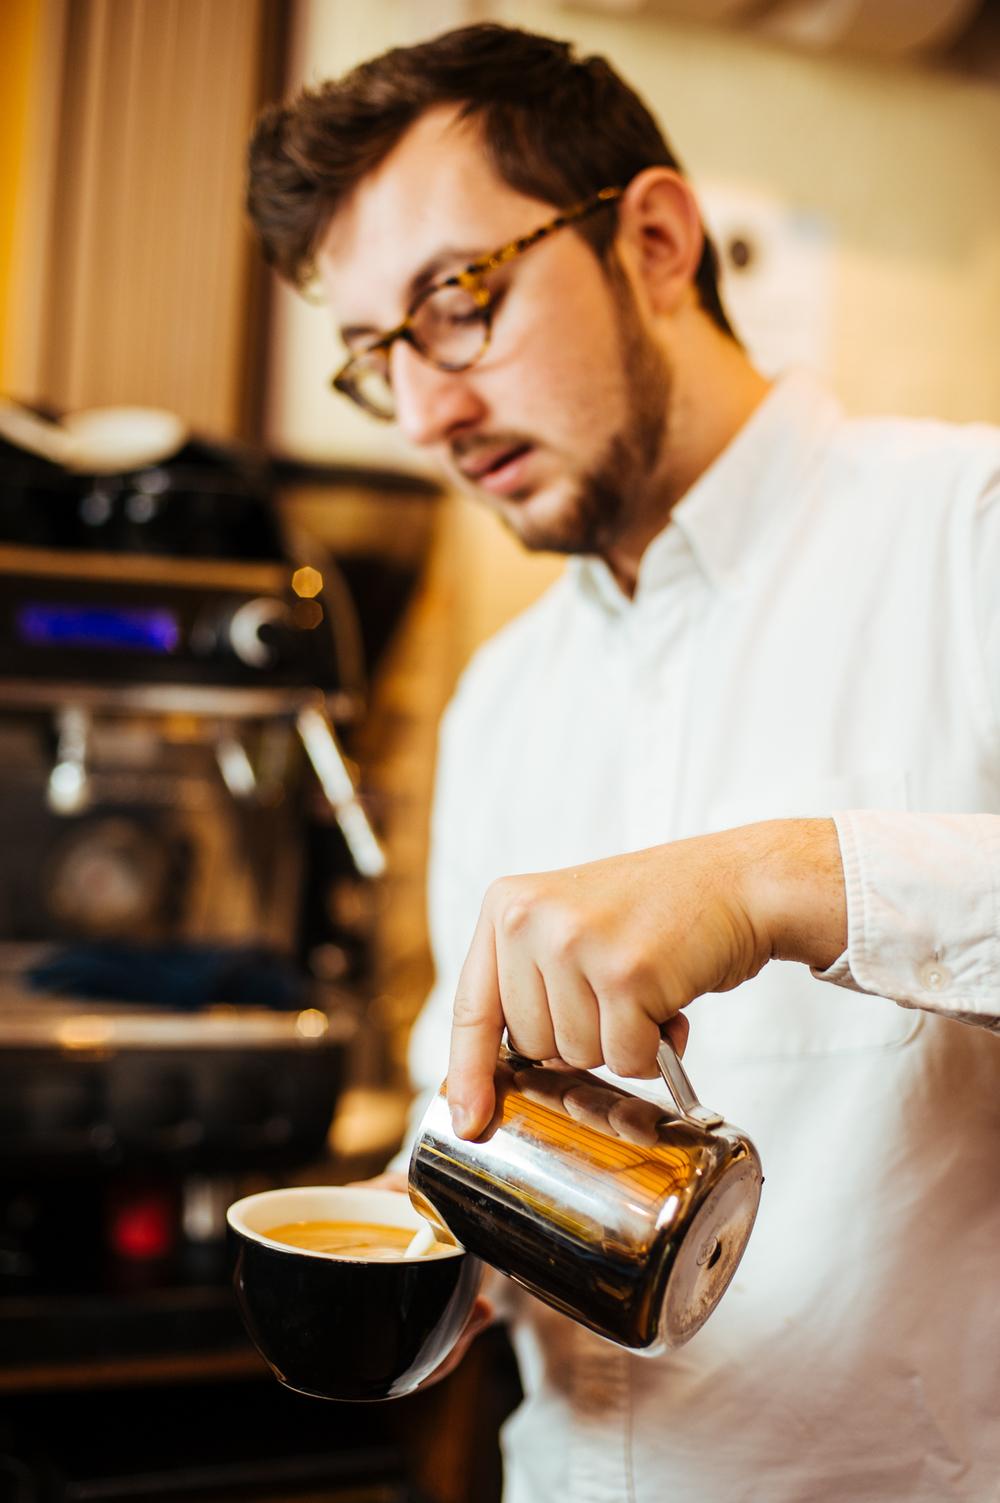 AllSaints Coffee Shop Leatherhead 2015-64.JPG